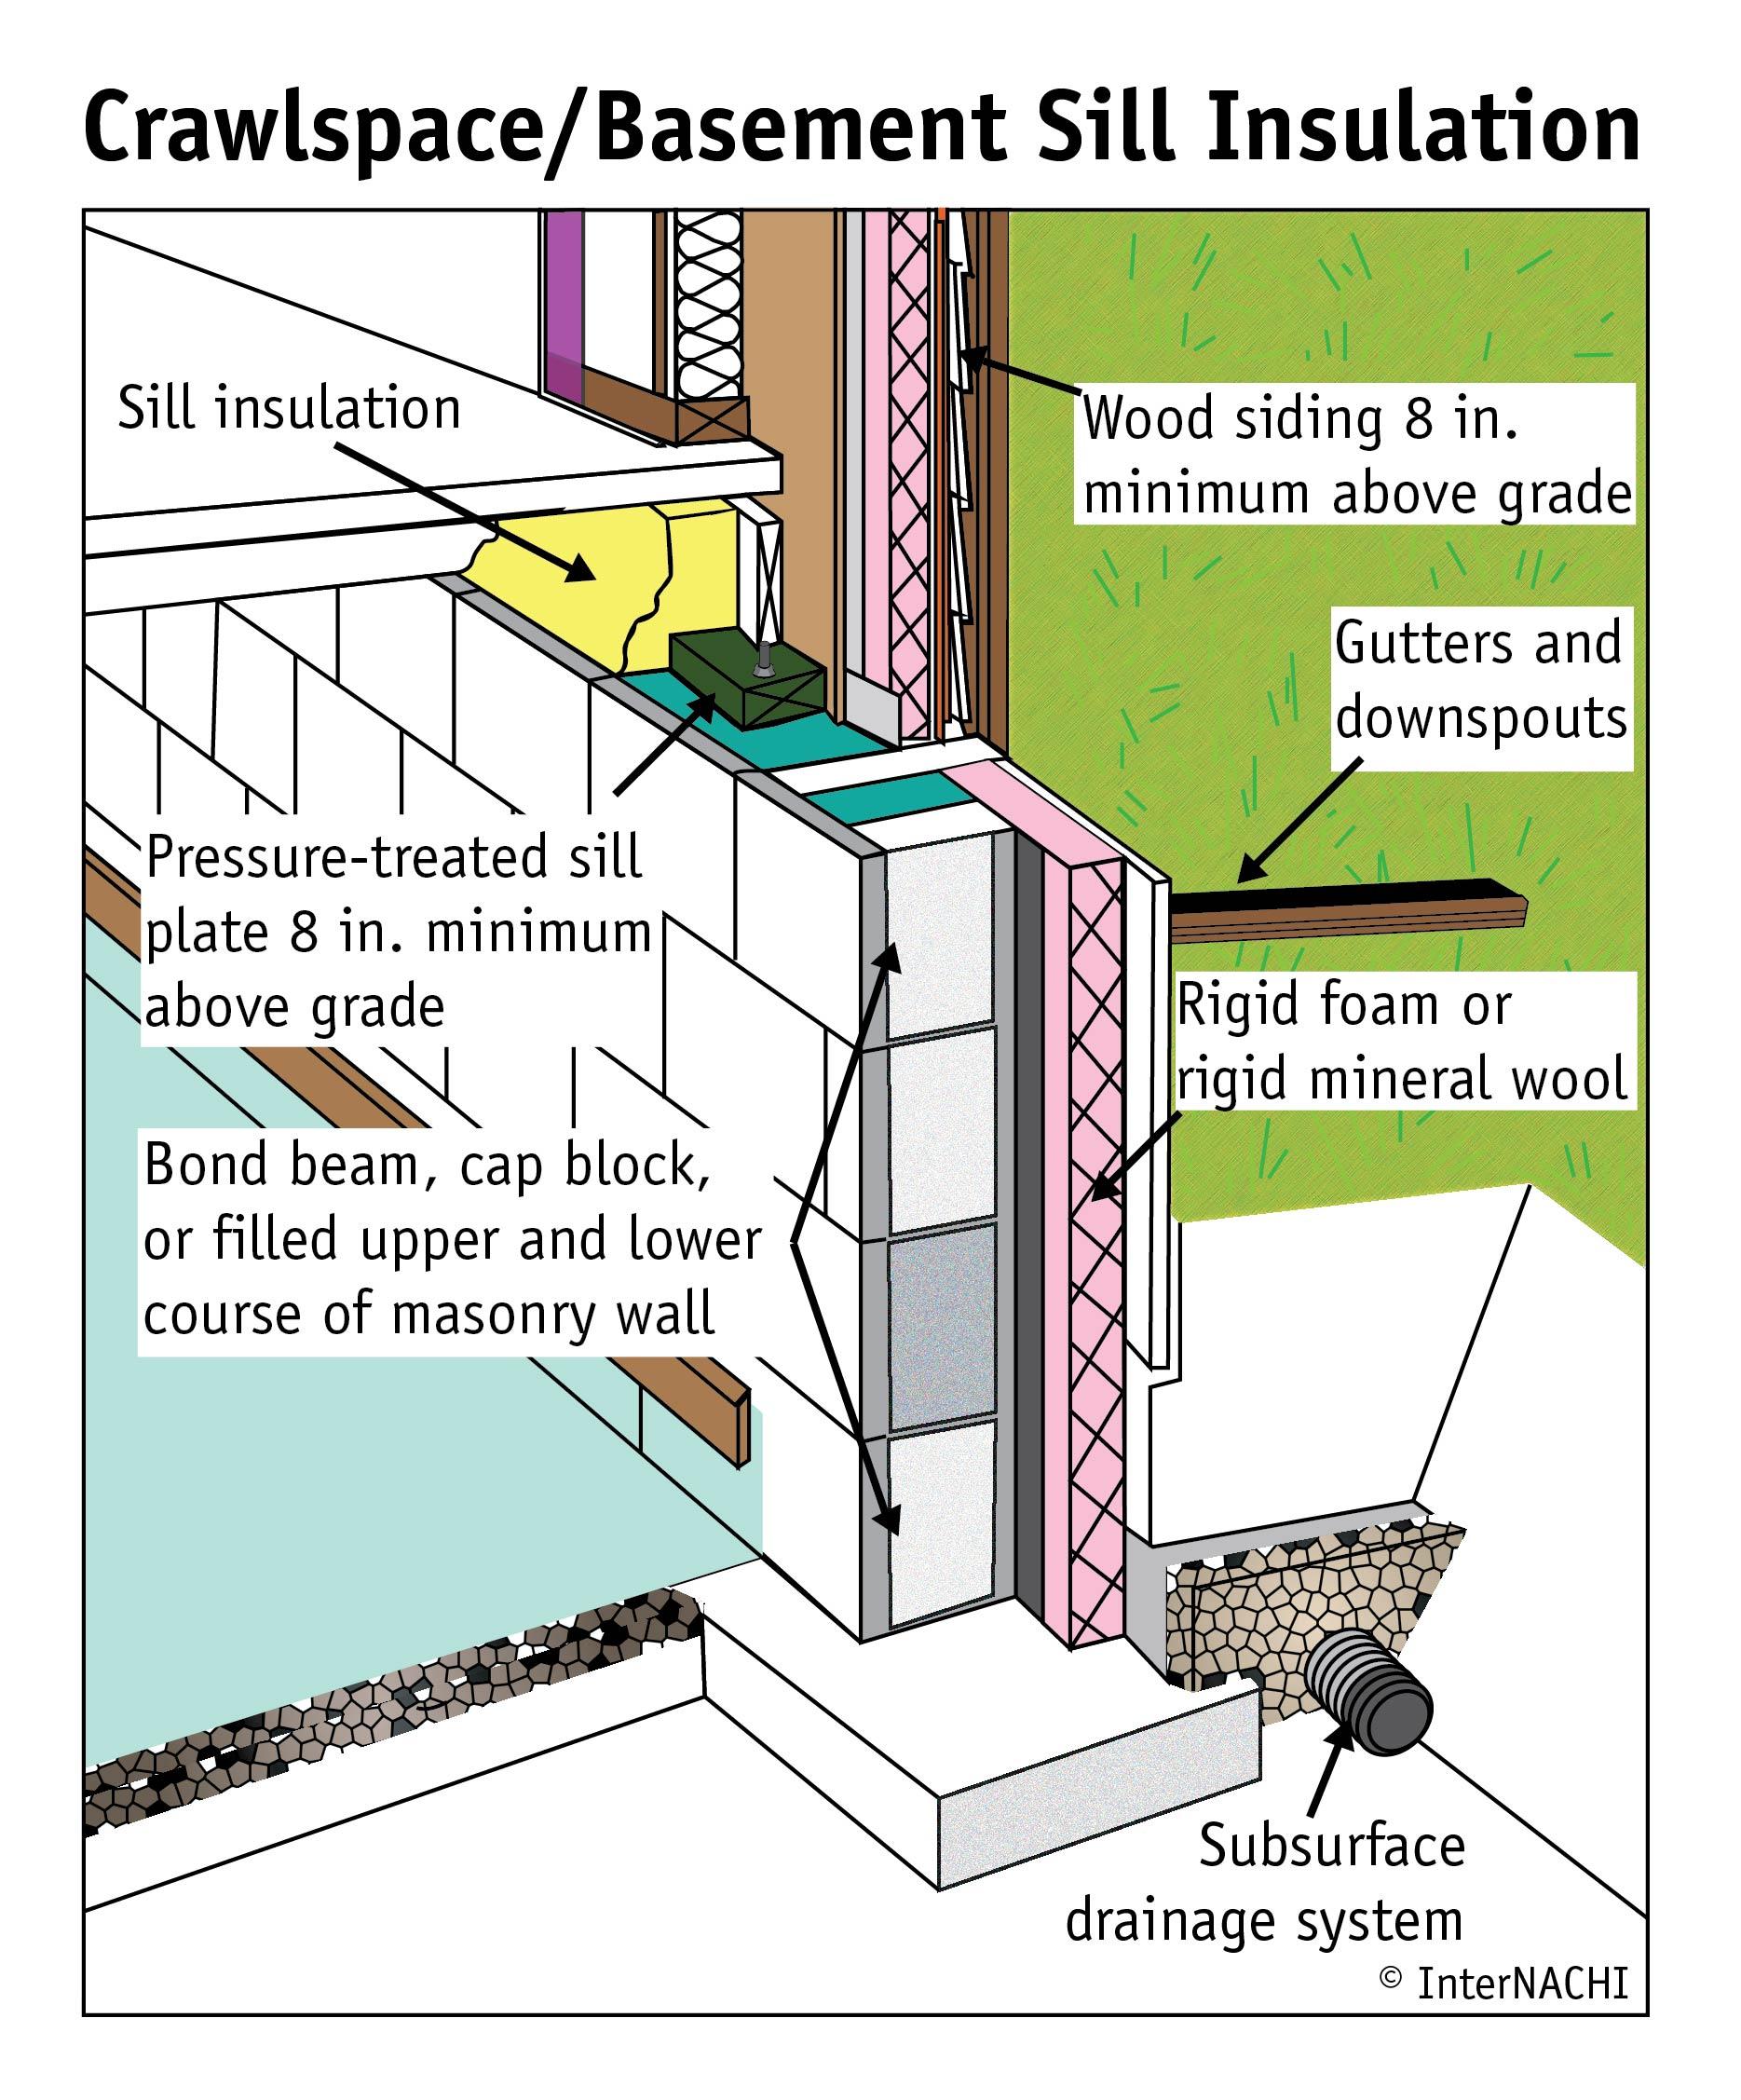 Crawlspace/basement sill insulation.